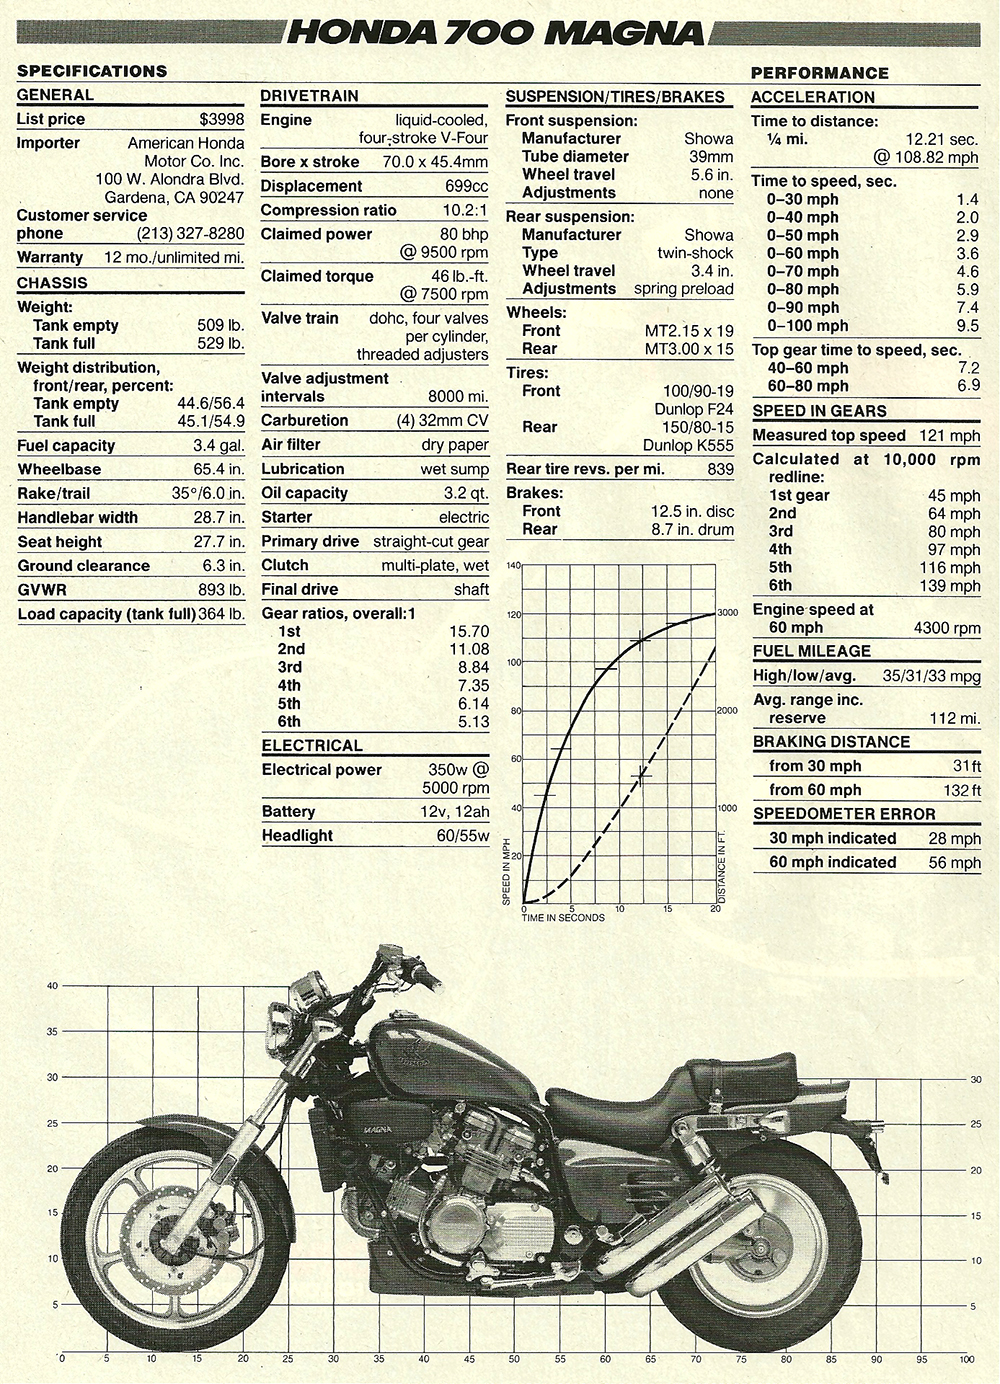 1987 Honda 700 Magna road test 08.jpg